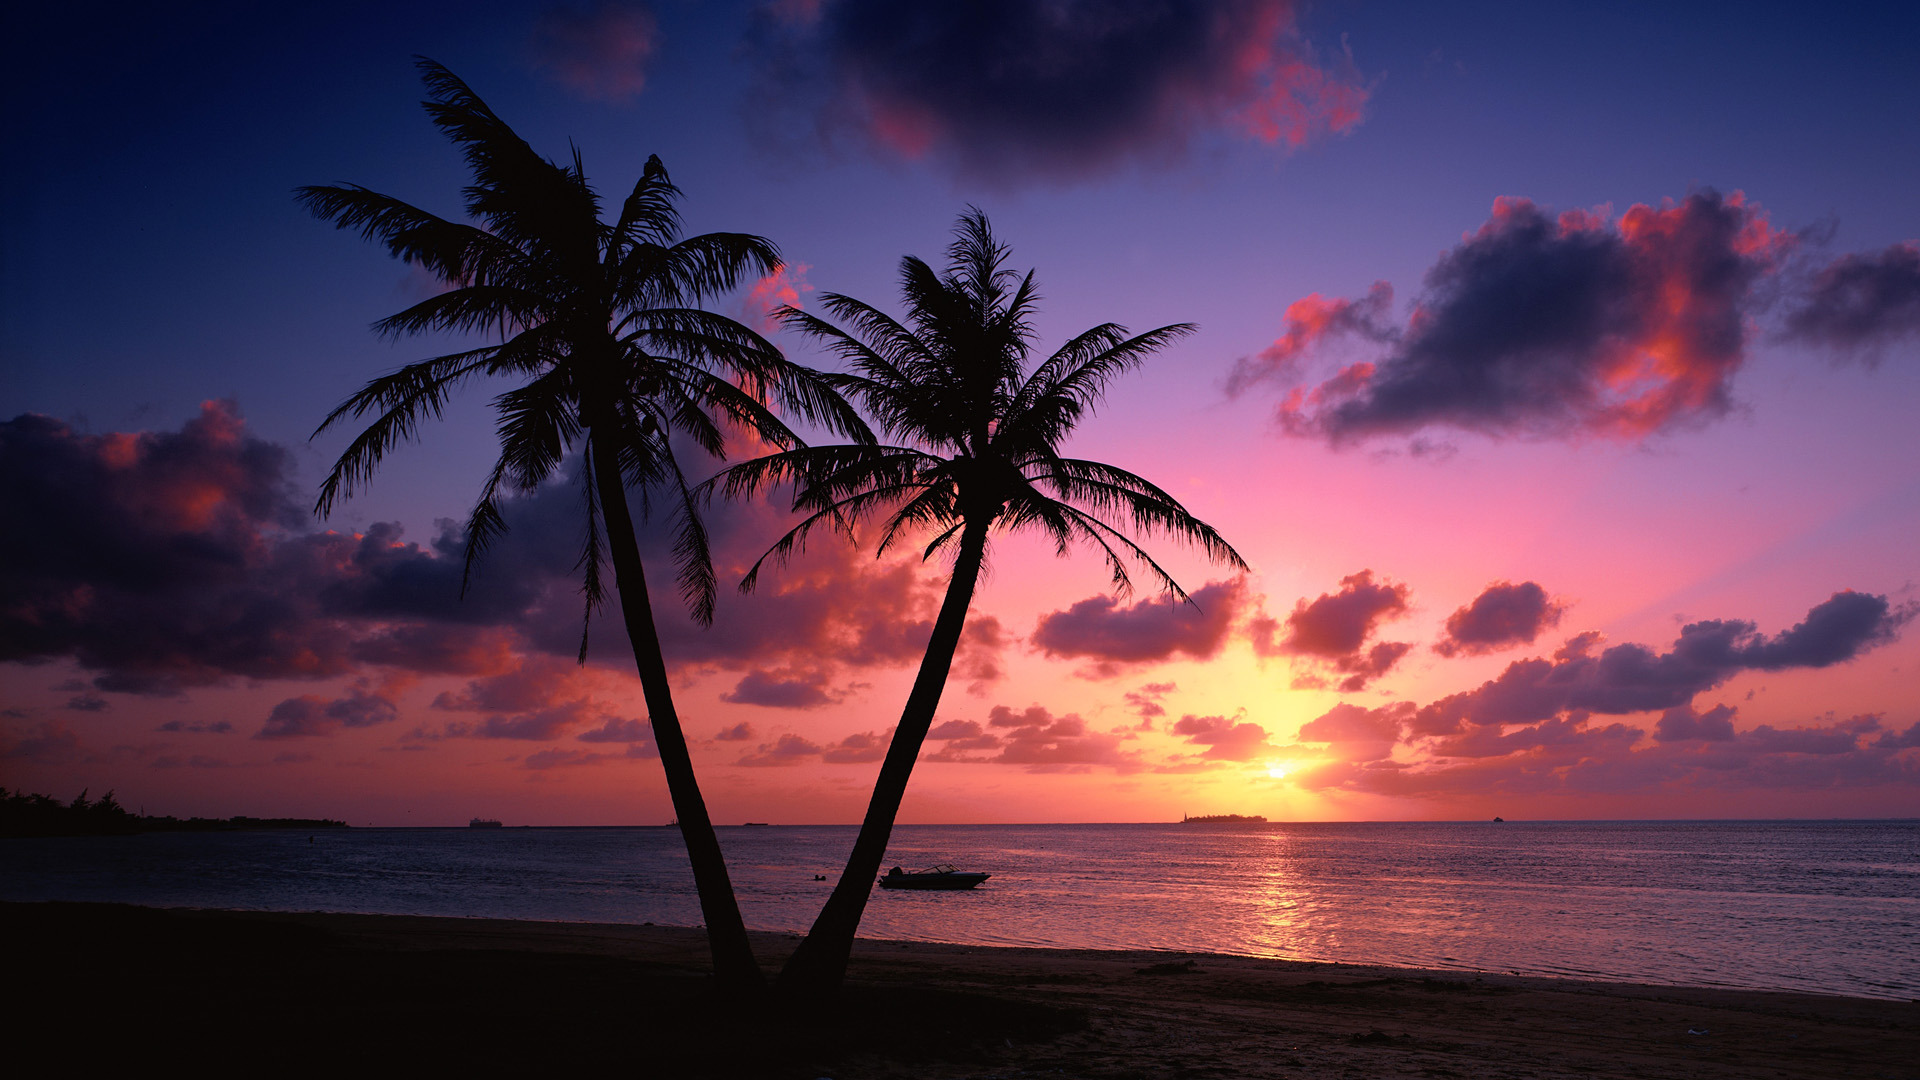 Pretty Landscape Sunset